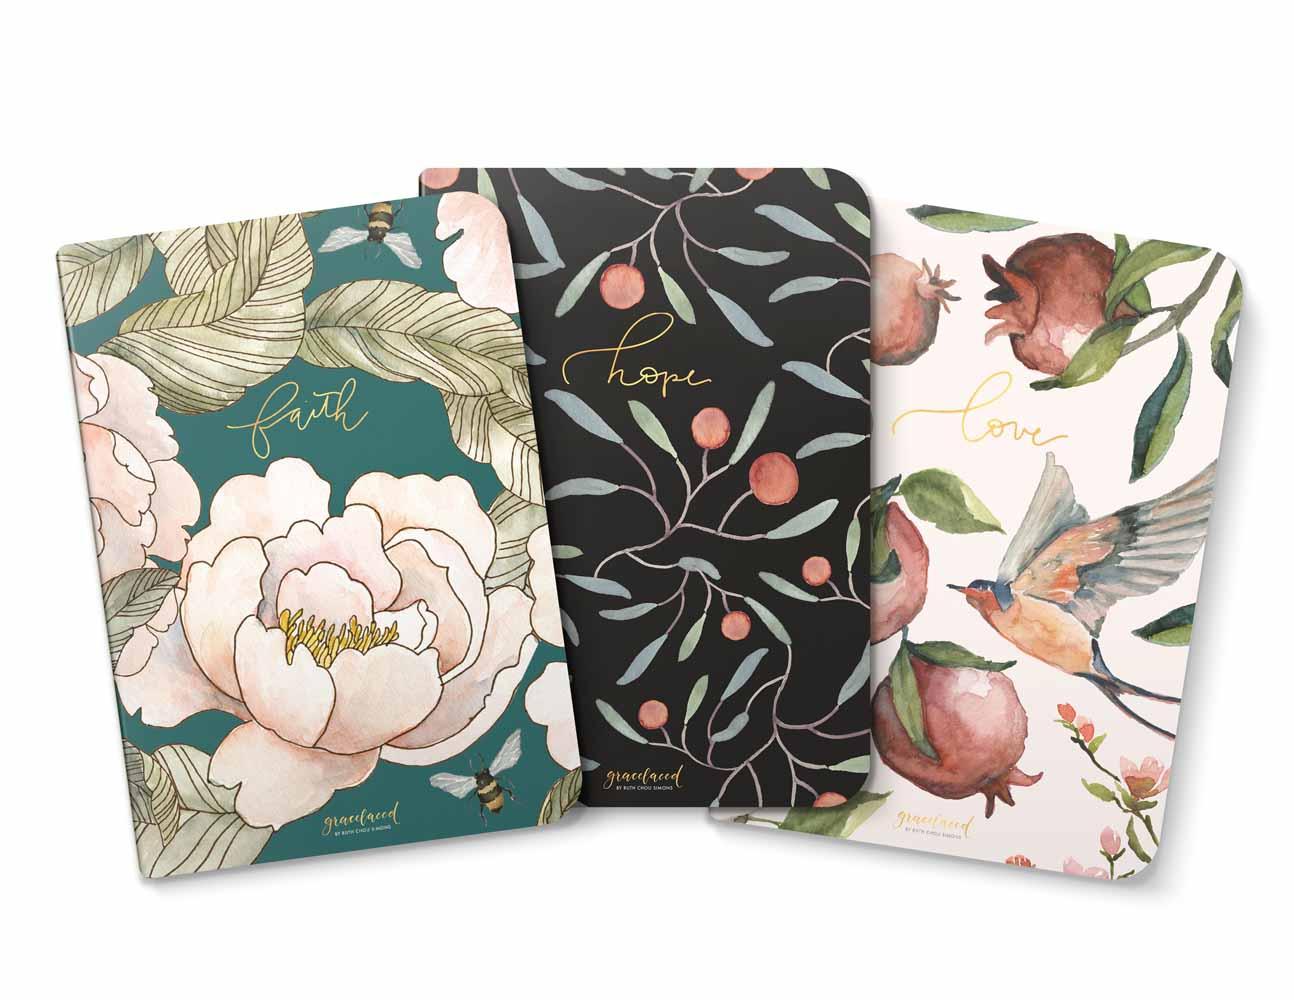 GraceLaced Lined Notebooks - Faith, Hope, Love (set of 3)